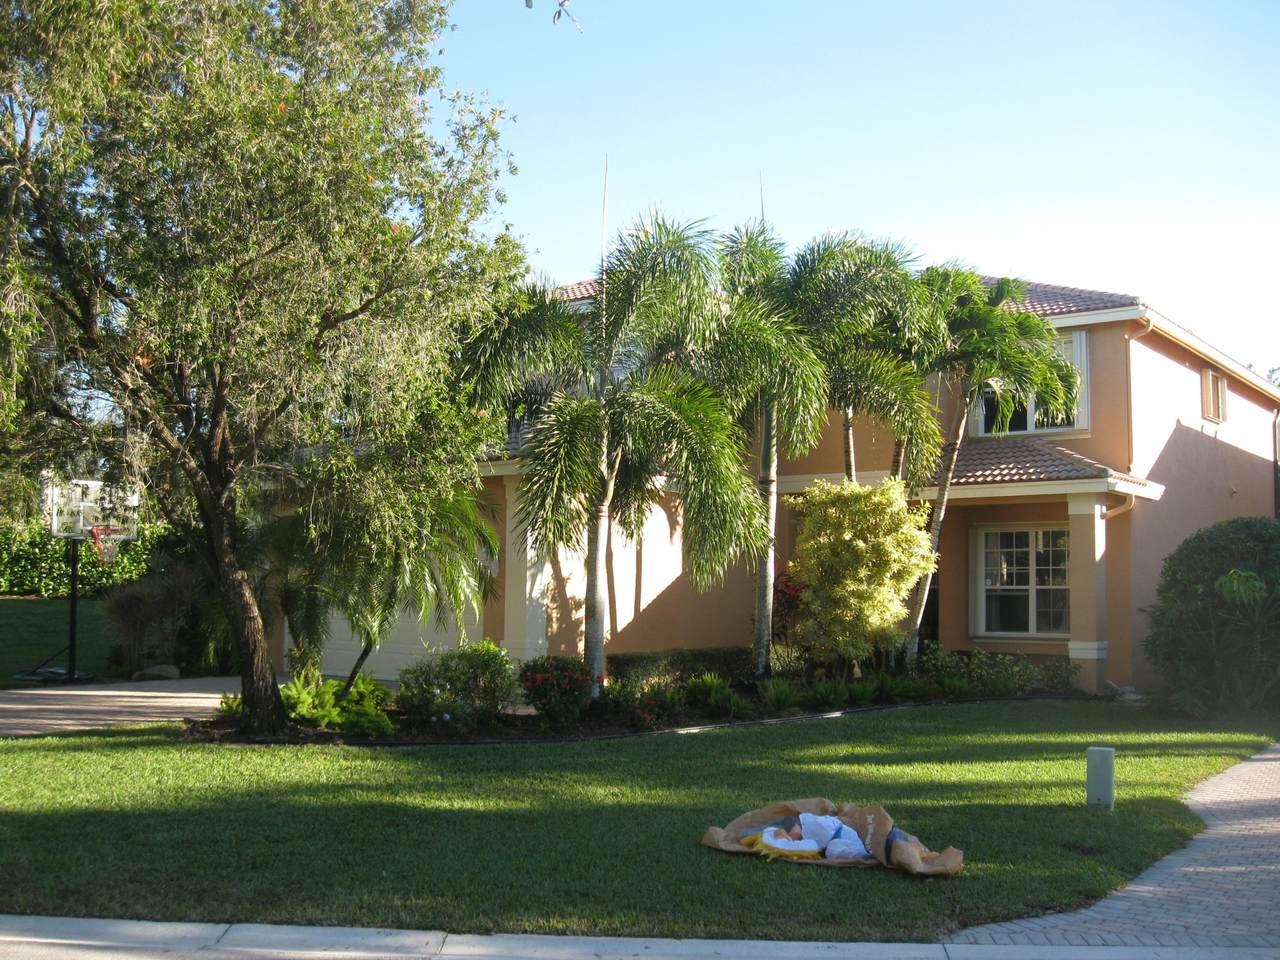 15828 Corintha Terrace - Photo 1